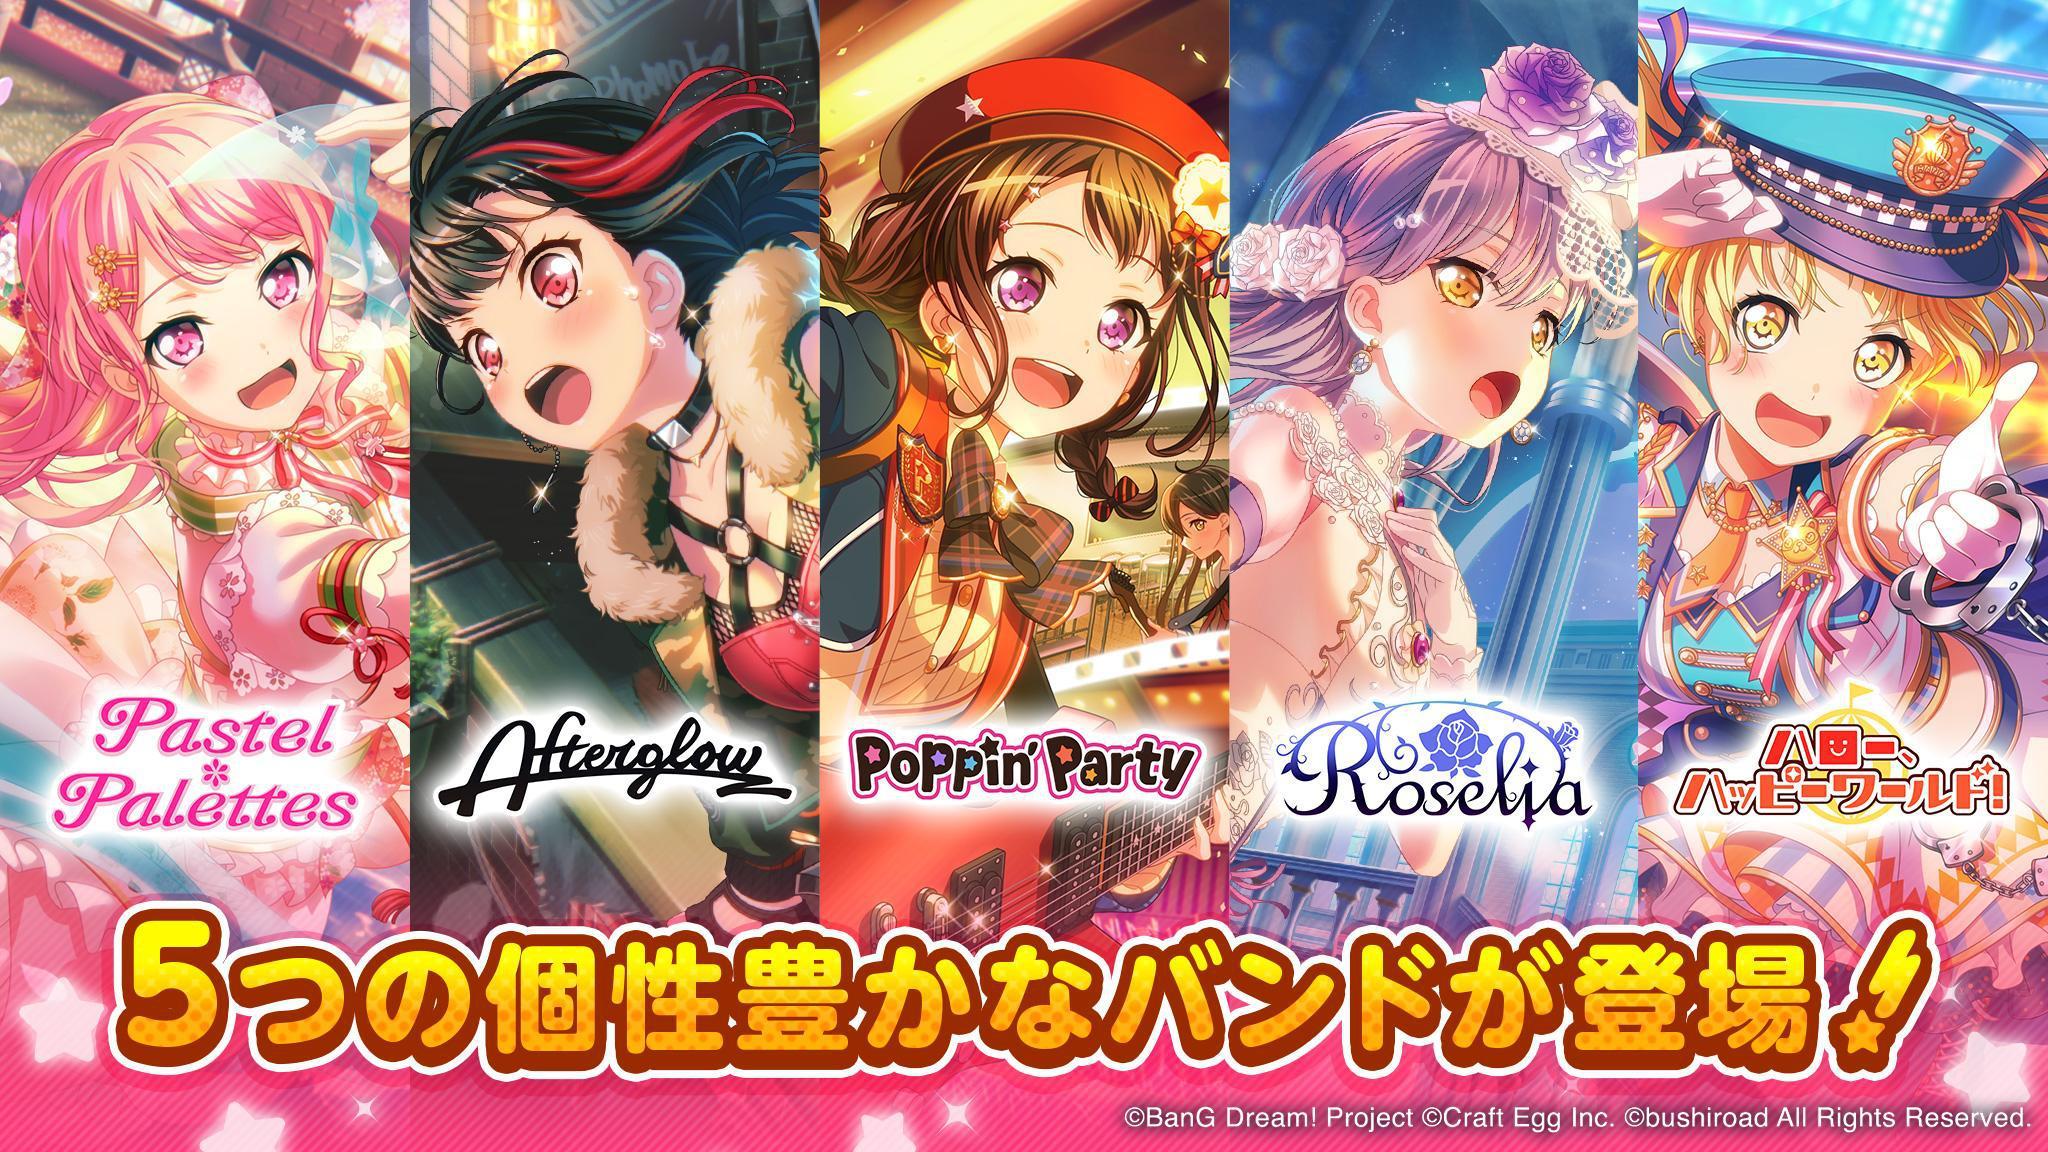 BanG Dream!少女乐团派对!(日服) 游戏截图4